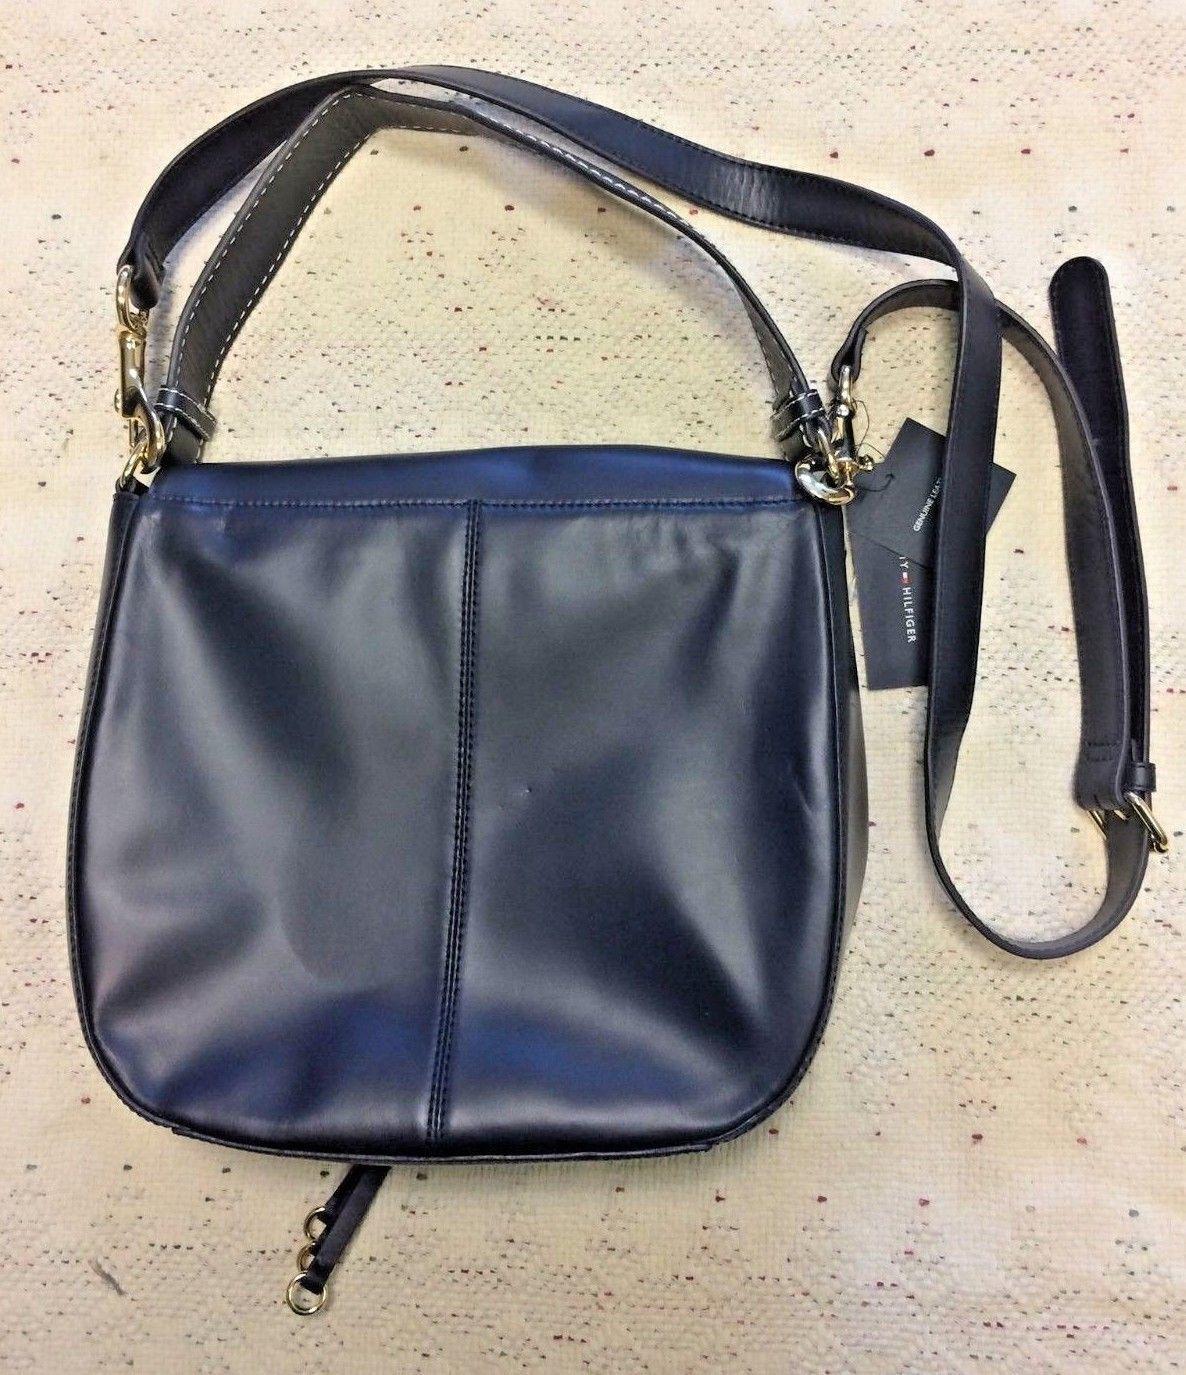 35c97715d18 ... NWT Tommy Hilfiger Star Hearts Deboss Honey Leather Messenger Purse  Handbag $198